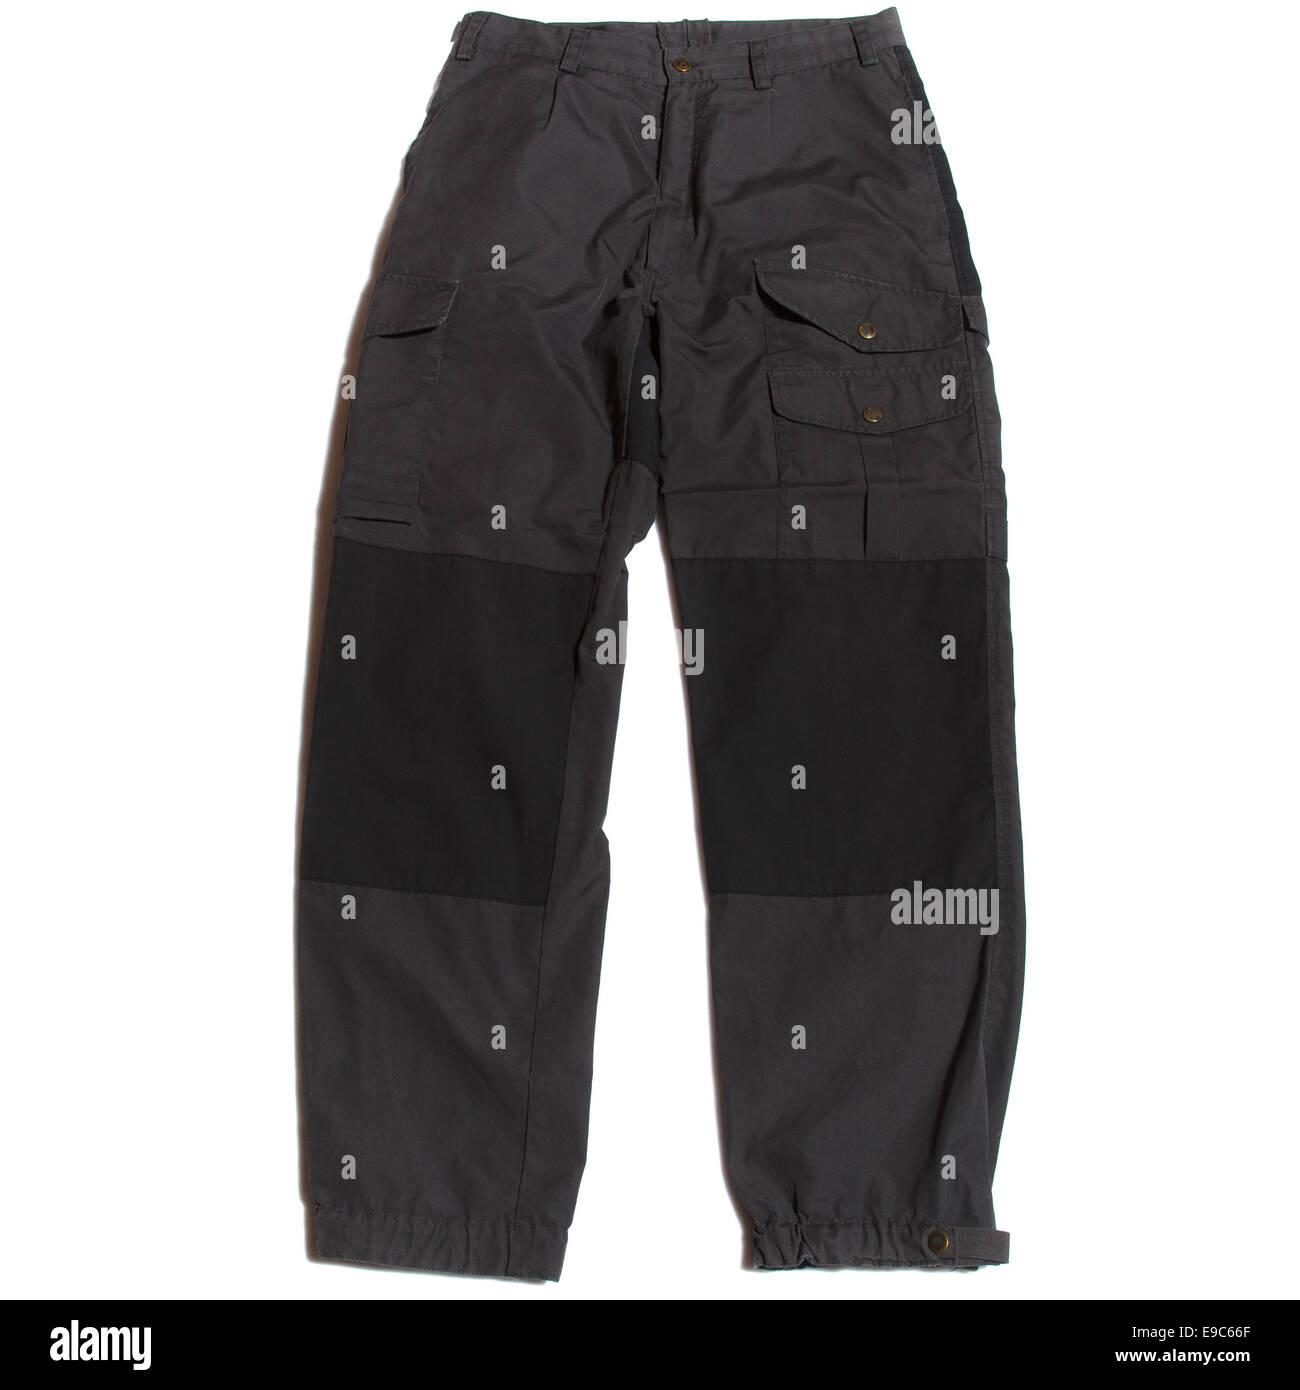 walking trousers - Stock Image